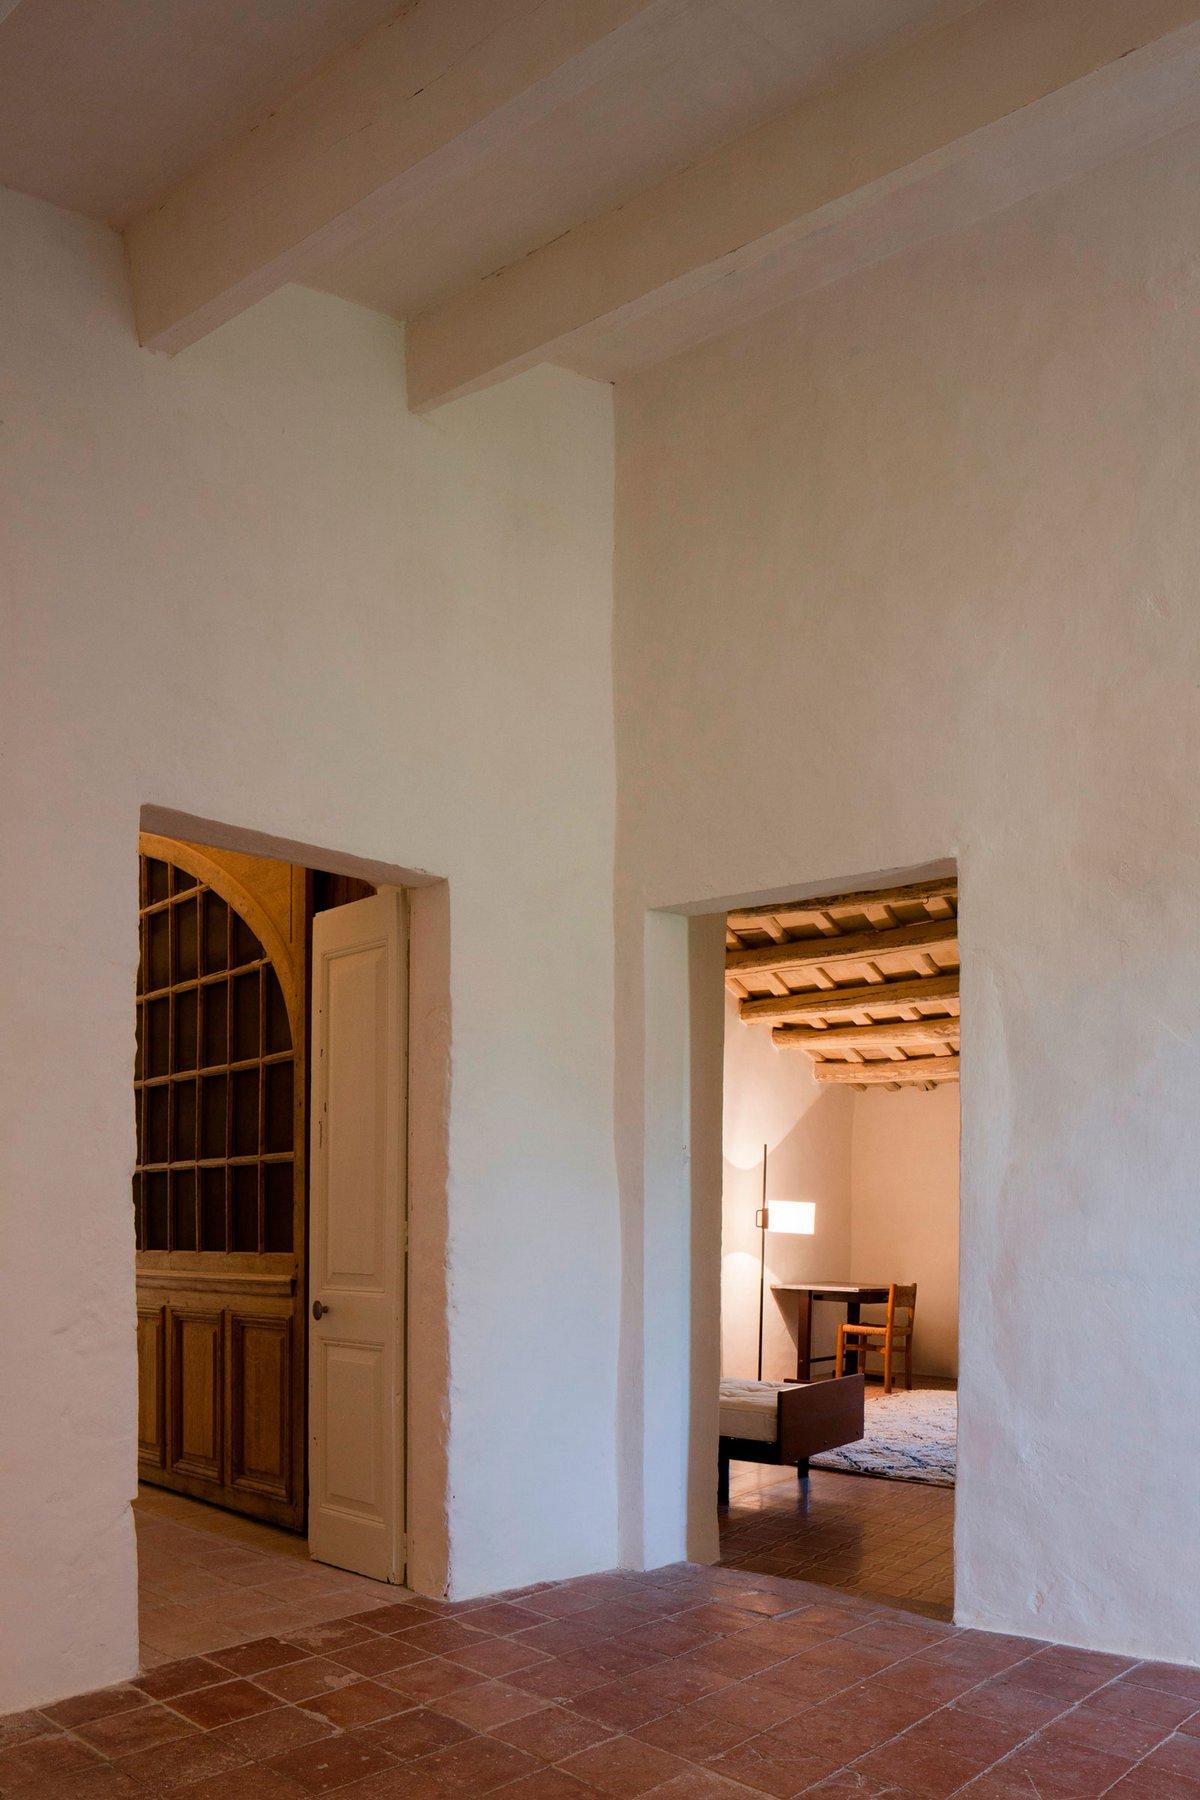 House in L'Emporda, Francesc Rife Studio, дома в Каталонии фото, дом в Эмпурде фото, старинный дом в Испании фото, жилая архитектура Испании фото